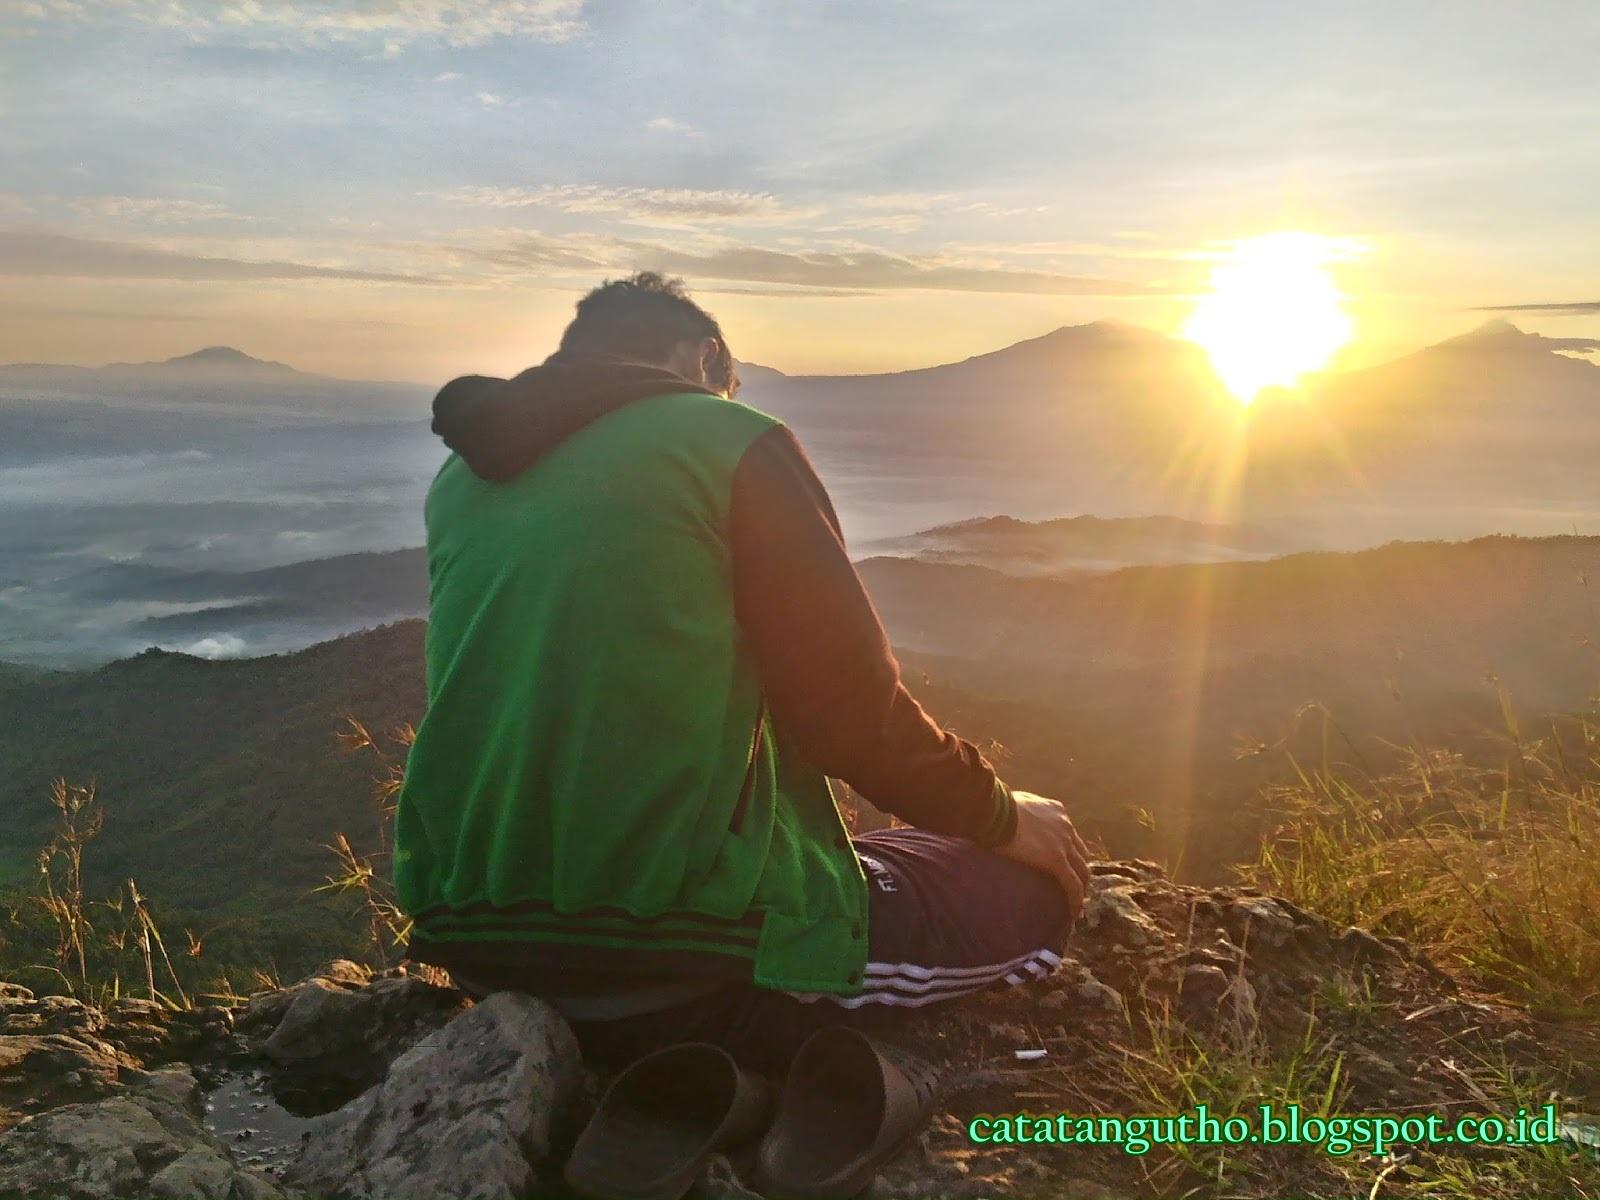 Catatan Gutho Kunjungi 25 Wisata Kamu Berada Kabupaten Gunung Kunir